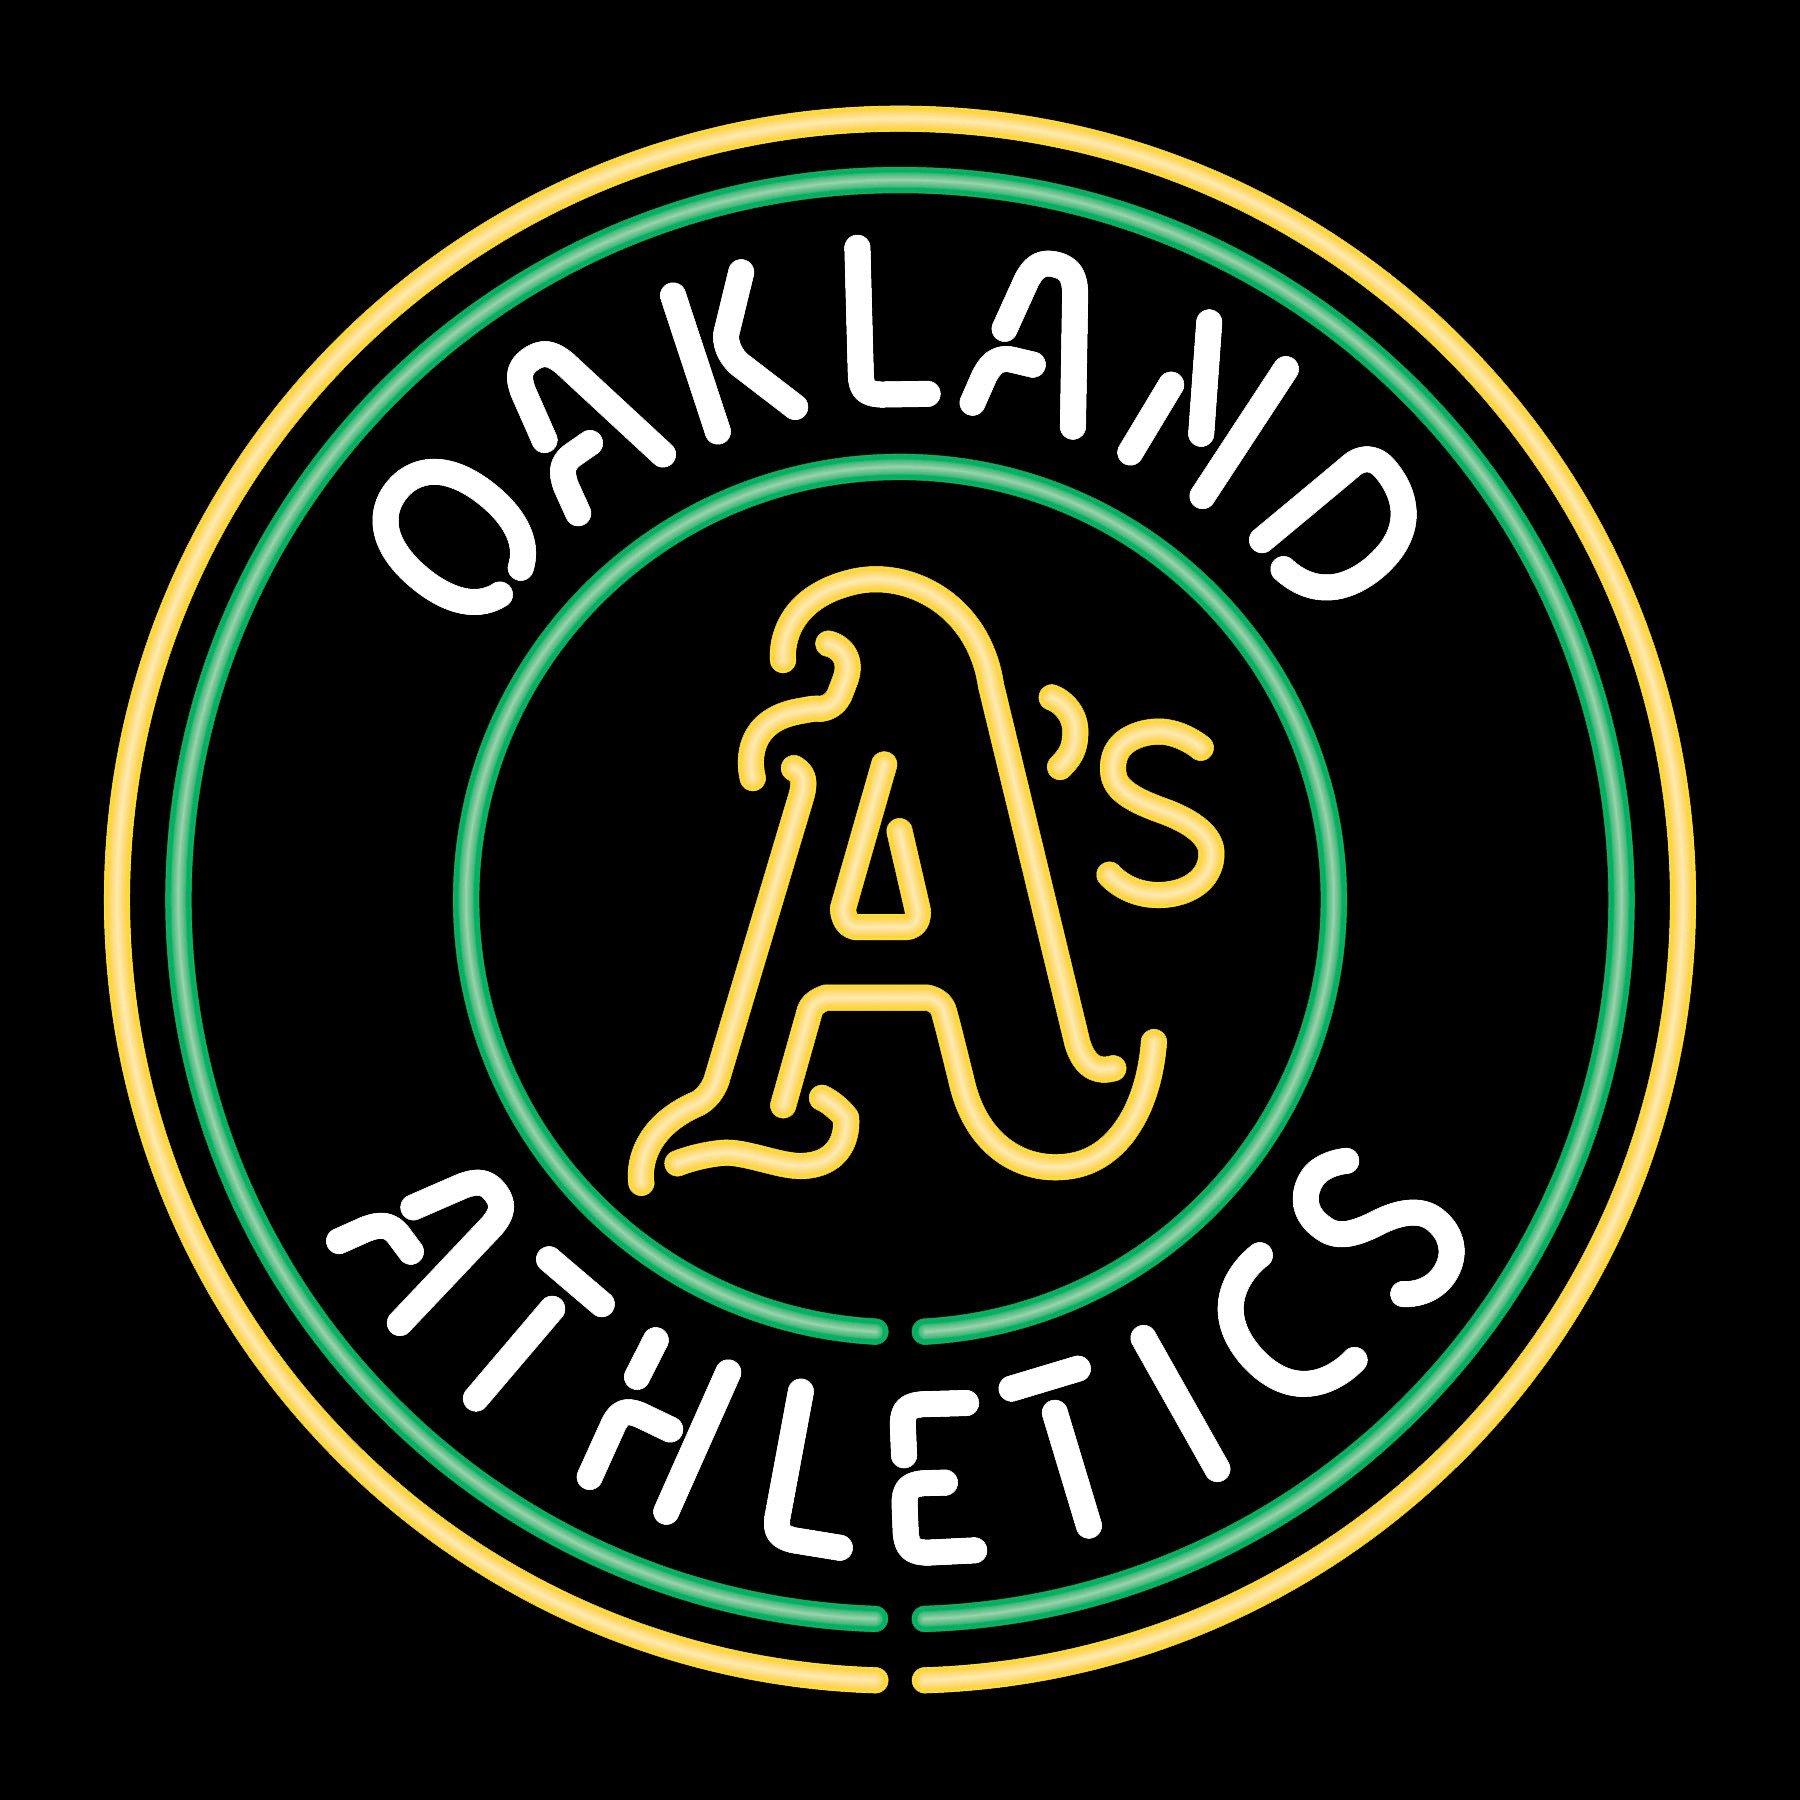 OAKLAND ATHLETICS mlb baseball 3 wallpaper background 1800x1800